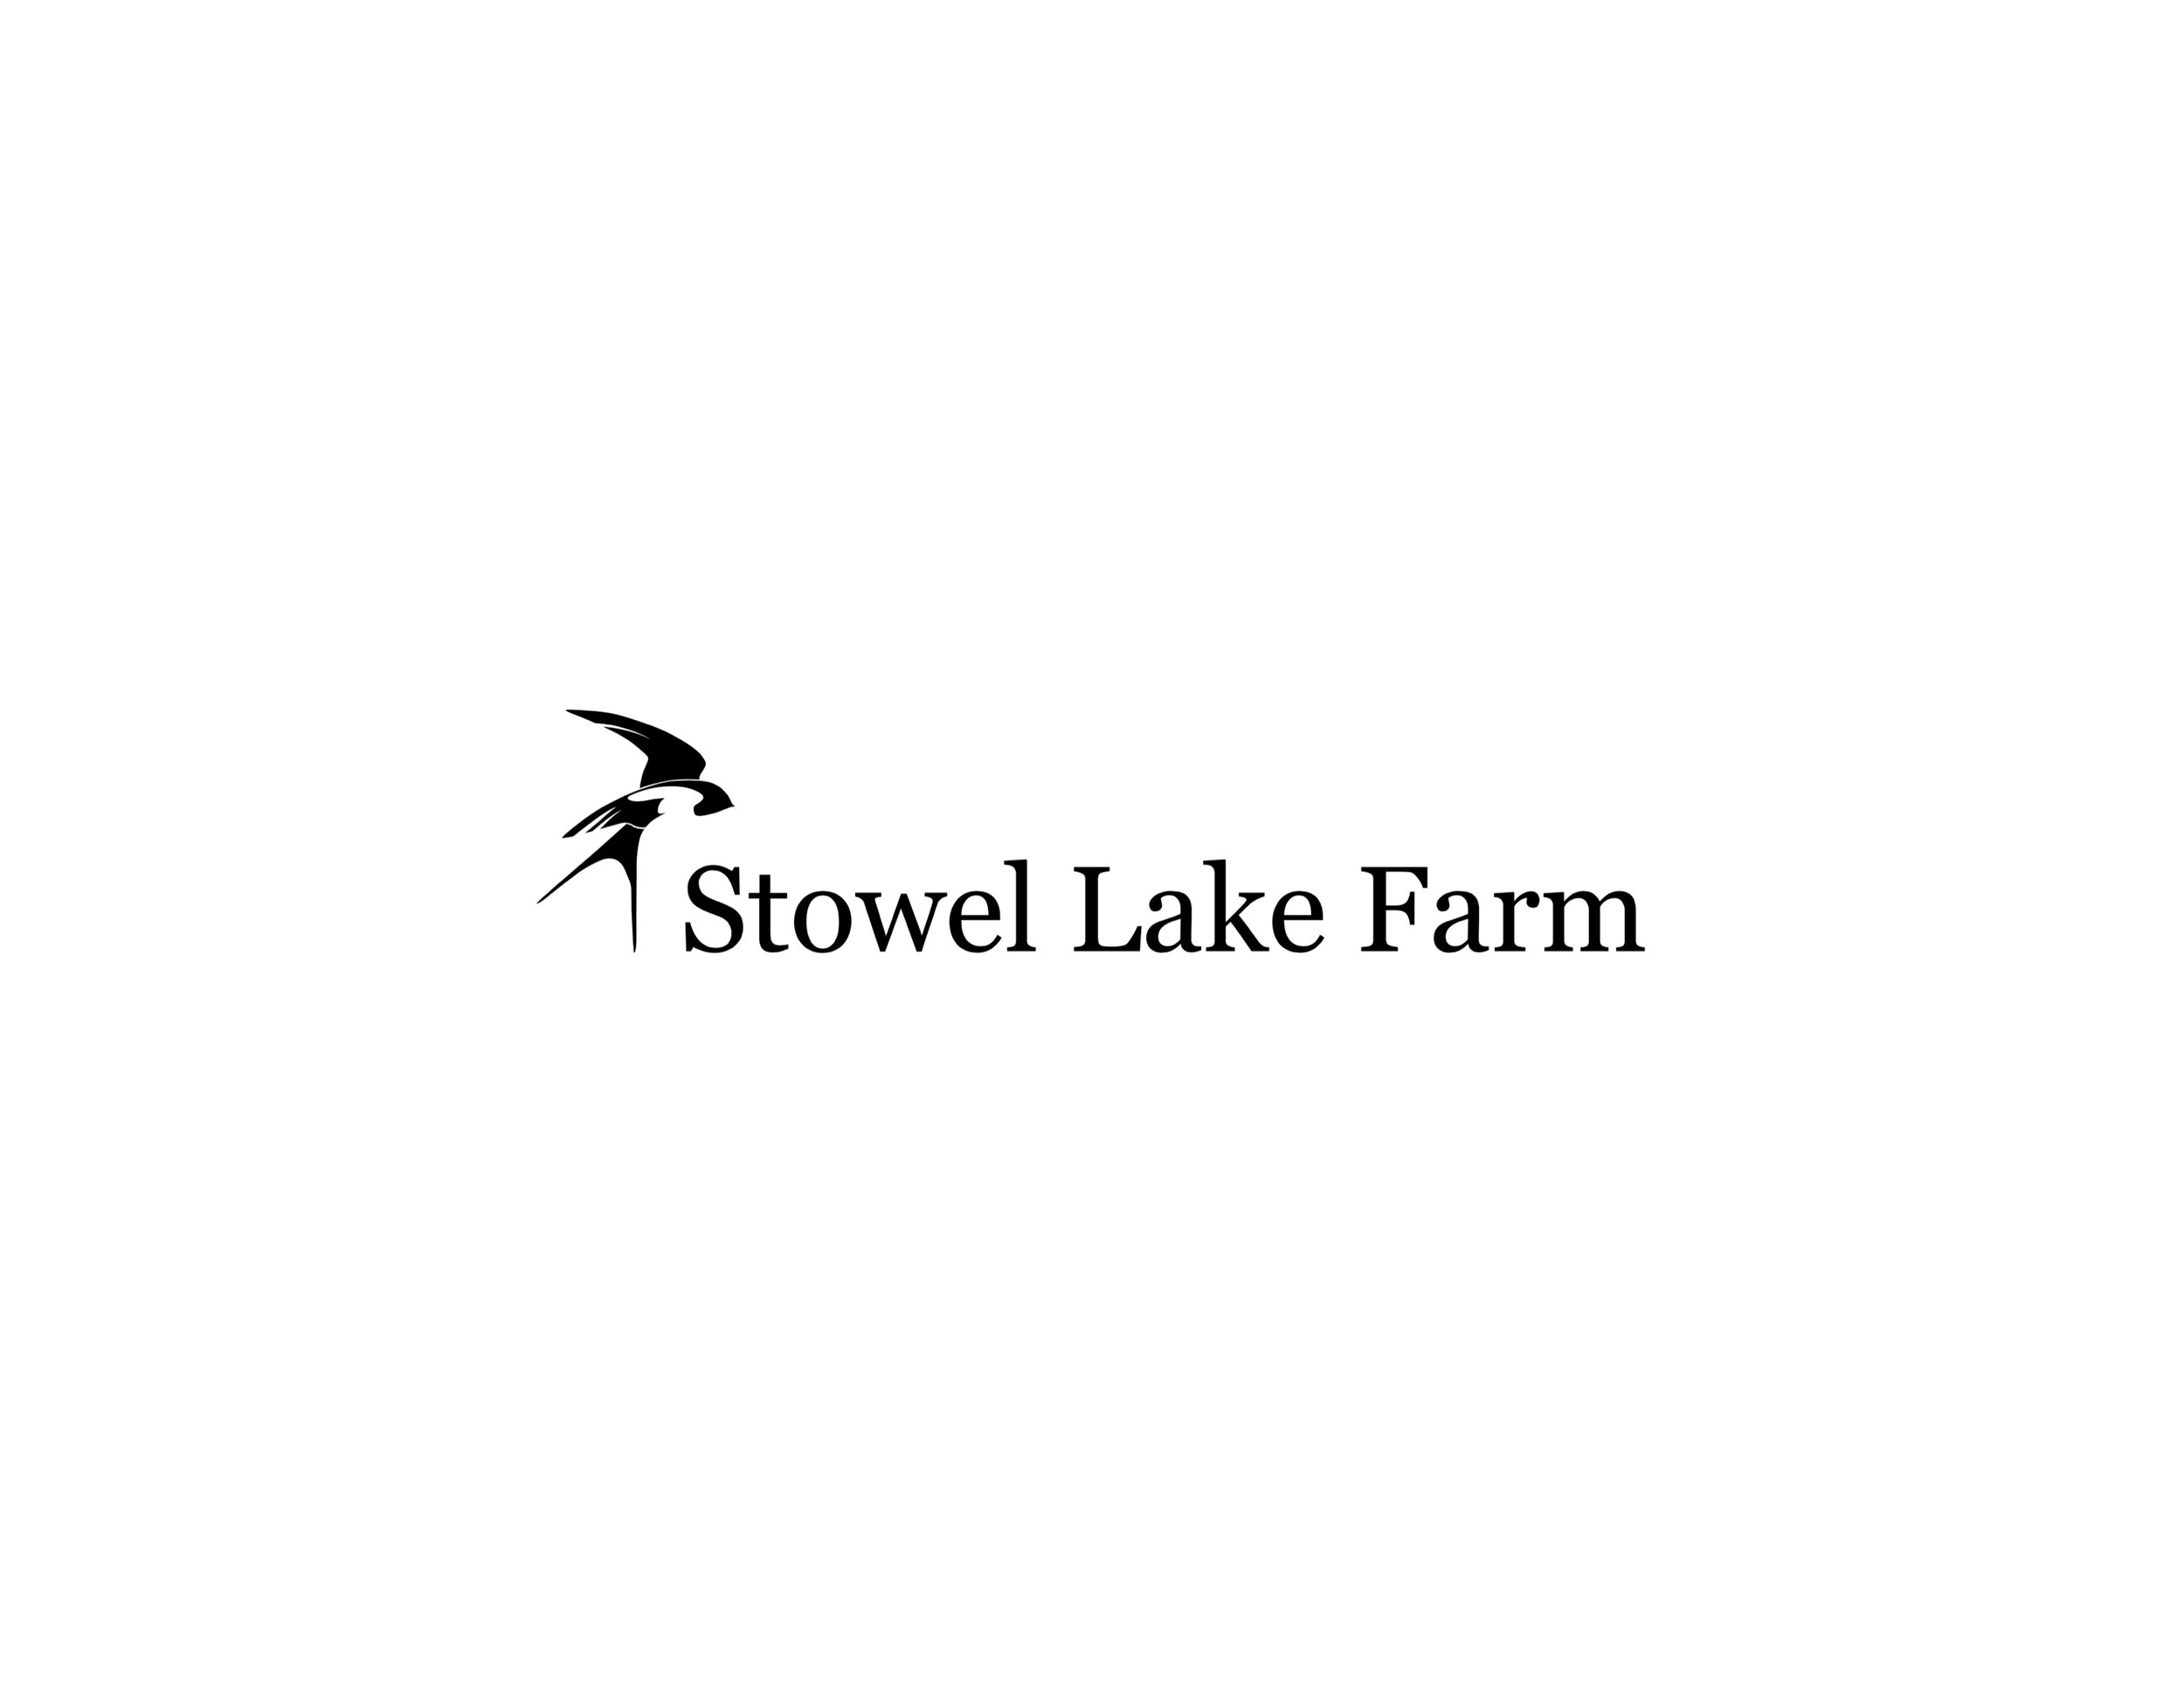 Logo: Stowel Lake Farm [illustrator draft]